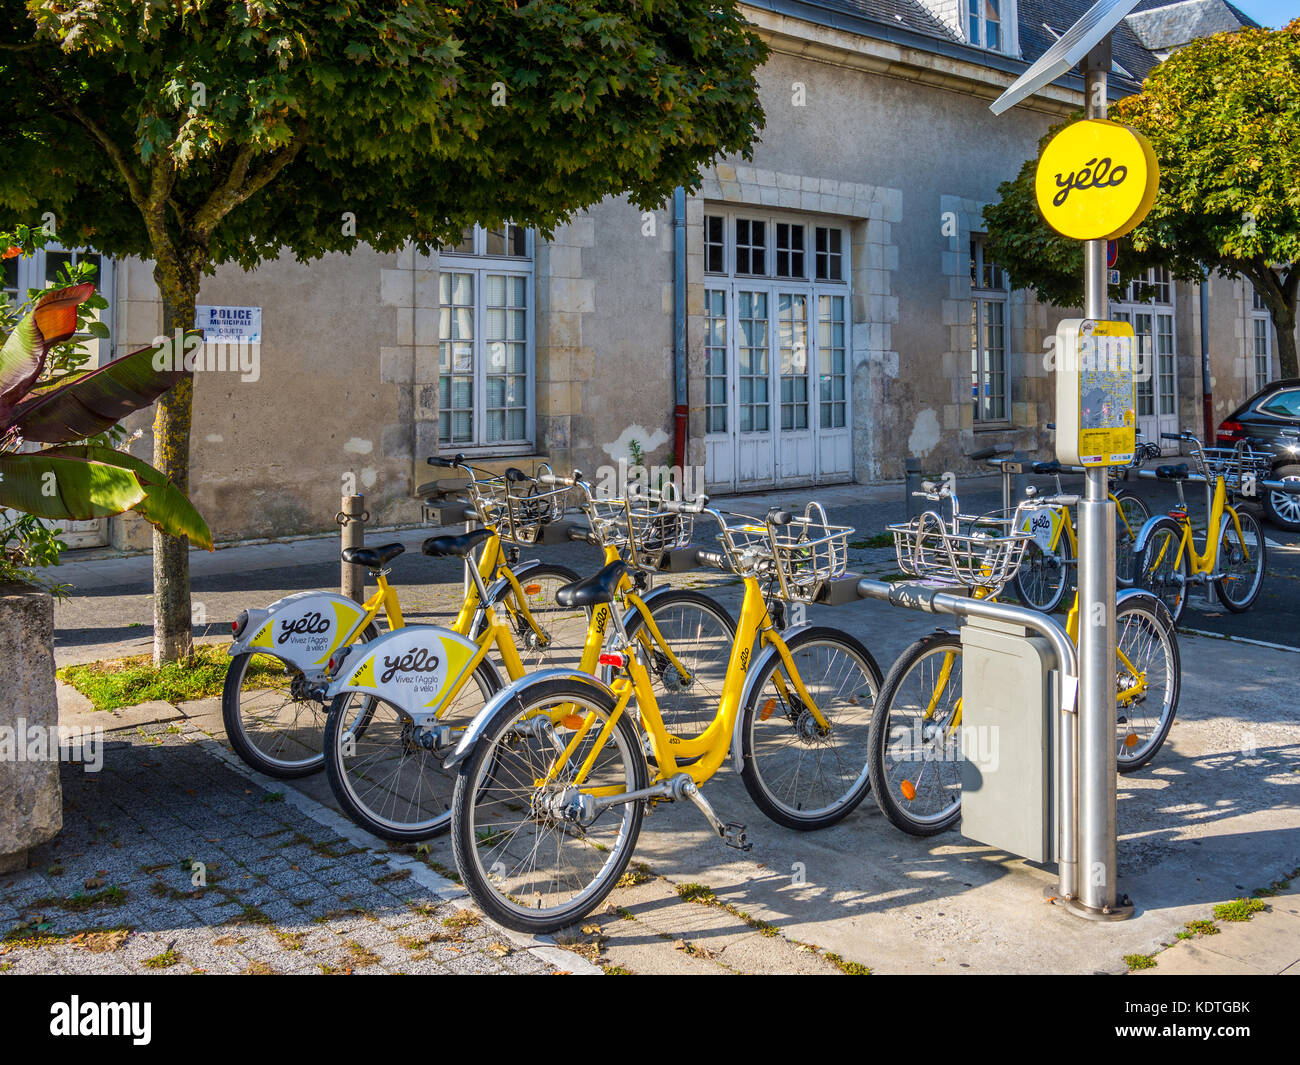 Yélo hire bicycles, La Rochelle, France. - Stock Image